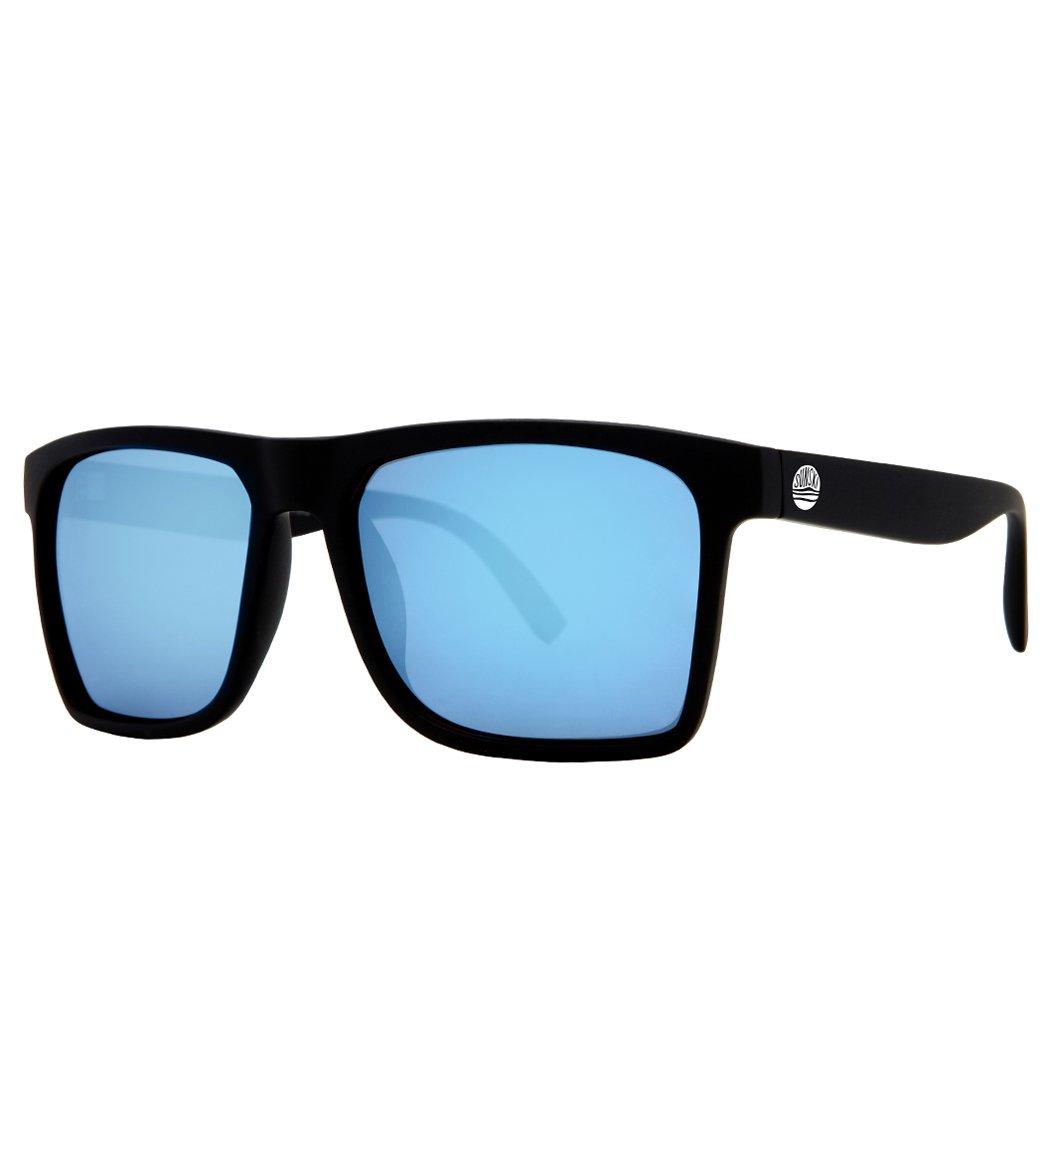 ac6c5d20e7 Sunski Taraval Polarized Sunglasses at SwimOutlet.com - Free Shipping